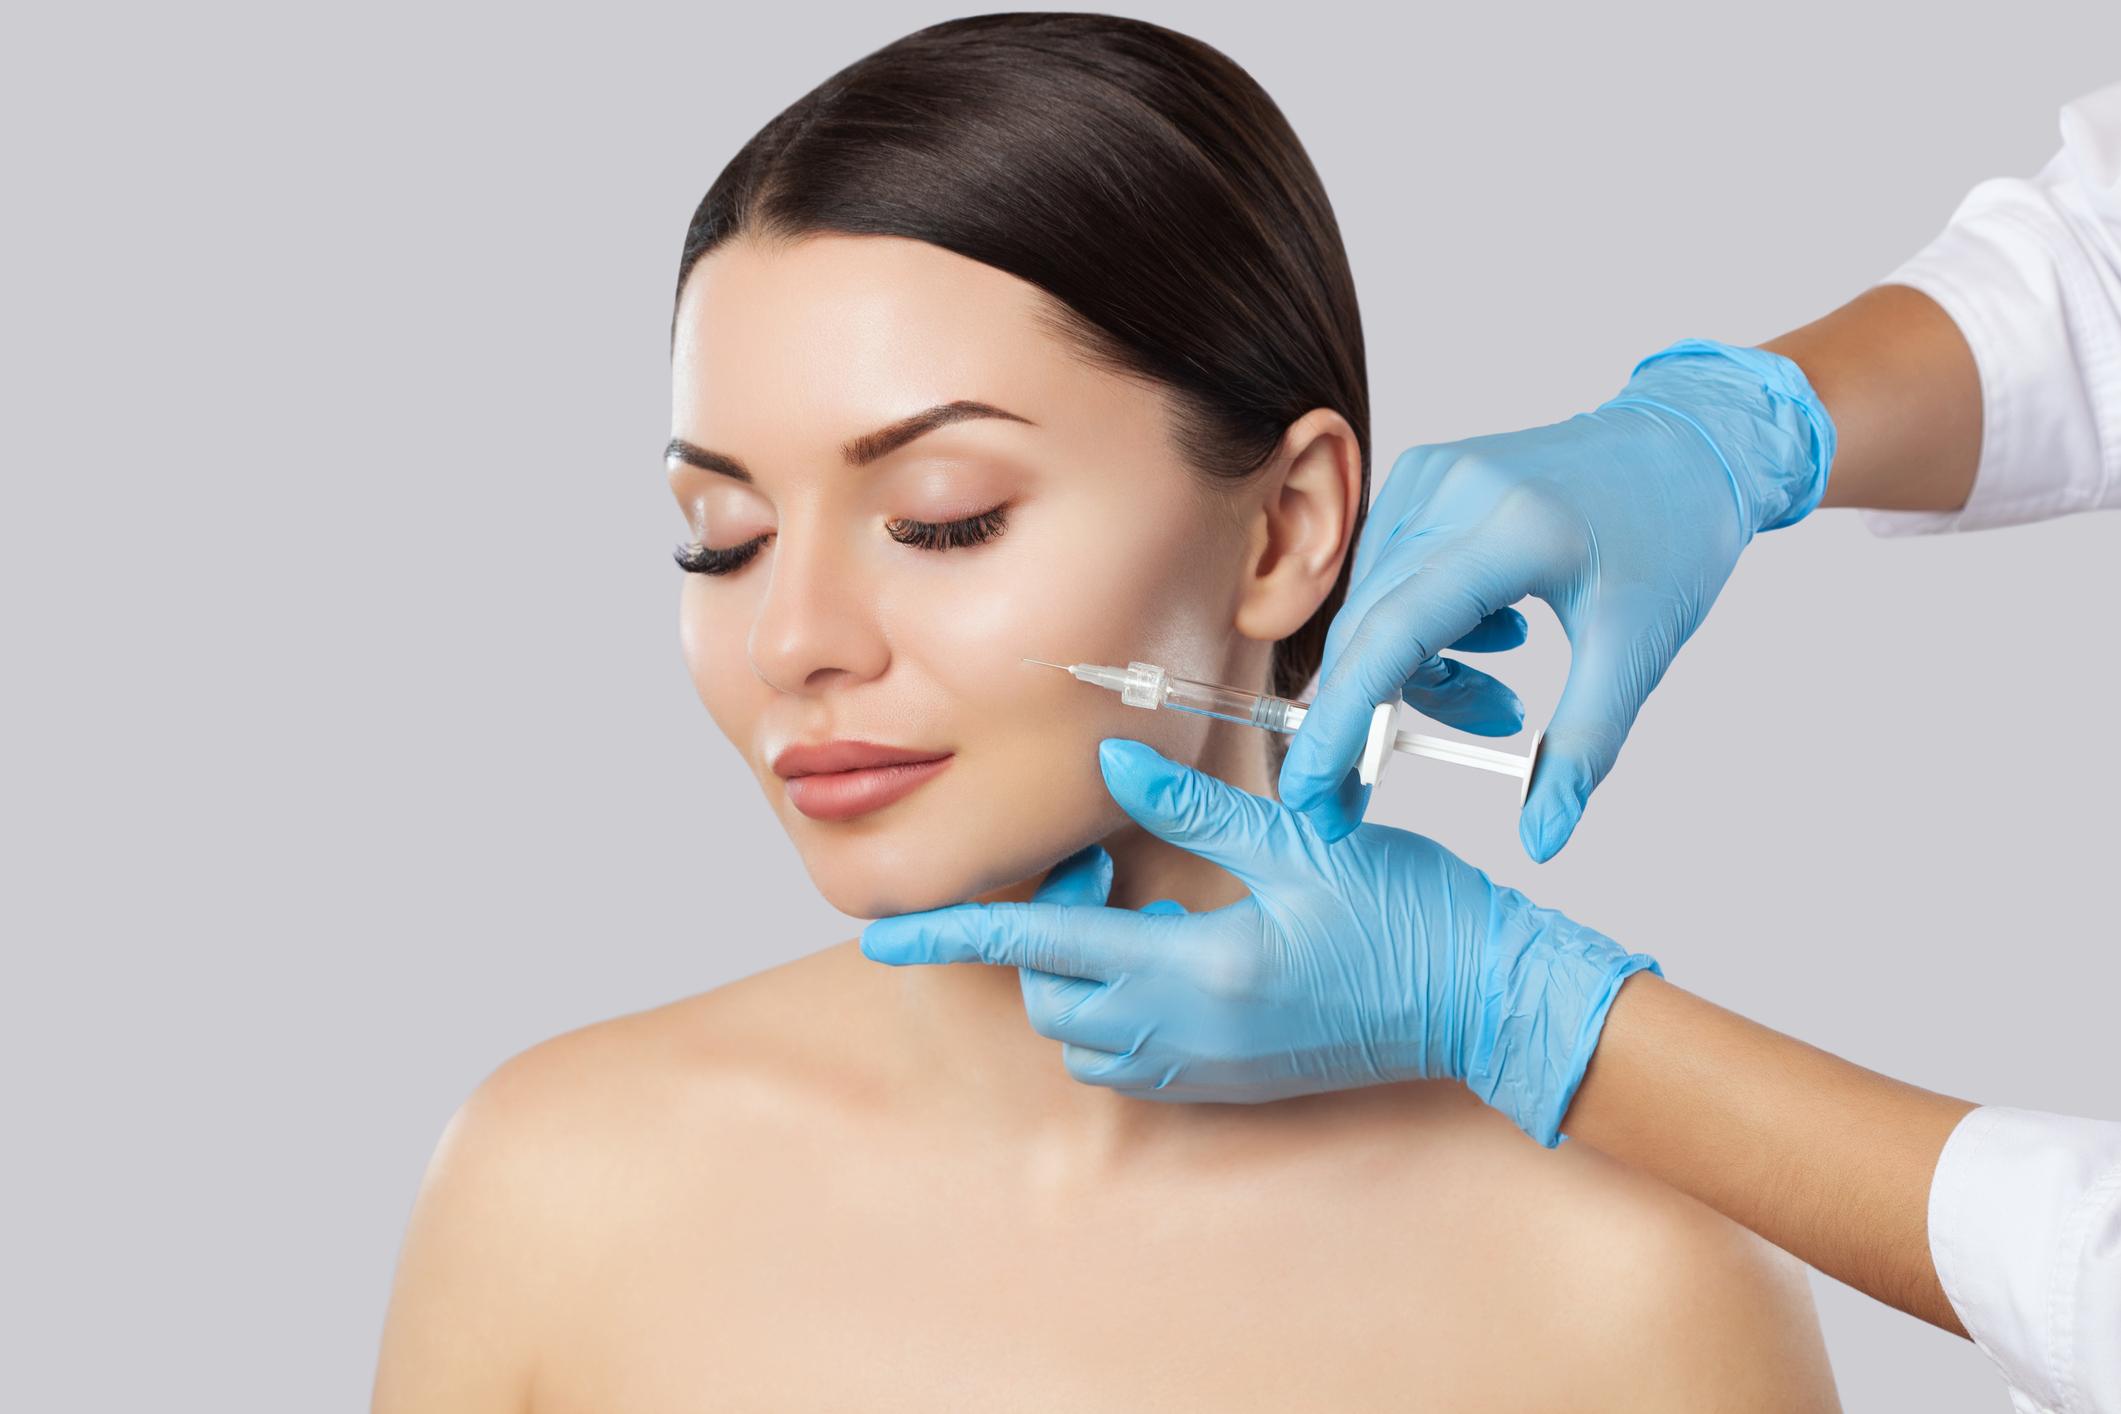 Model receiving botox injections